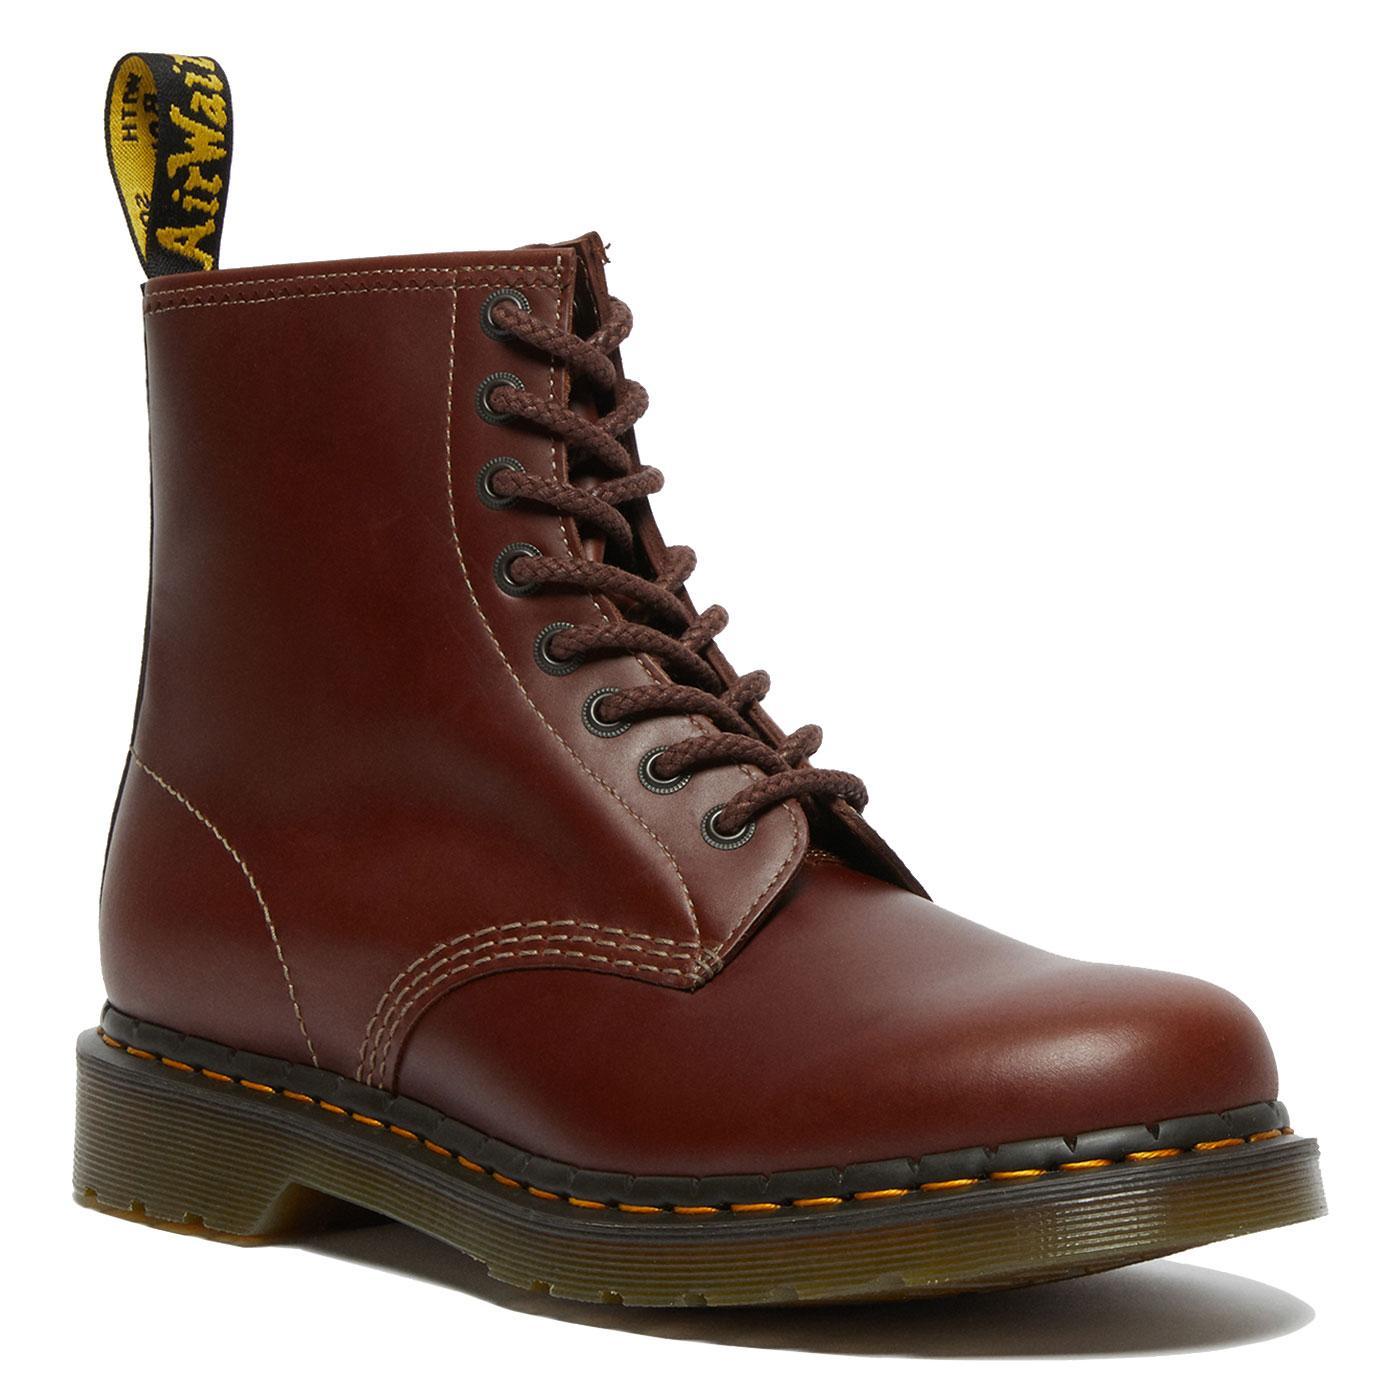 1460 DR MARTENS Abruzzo WP Boots - Brown/Black